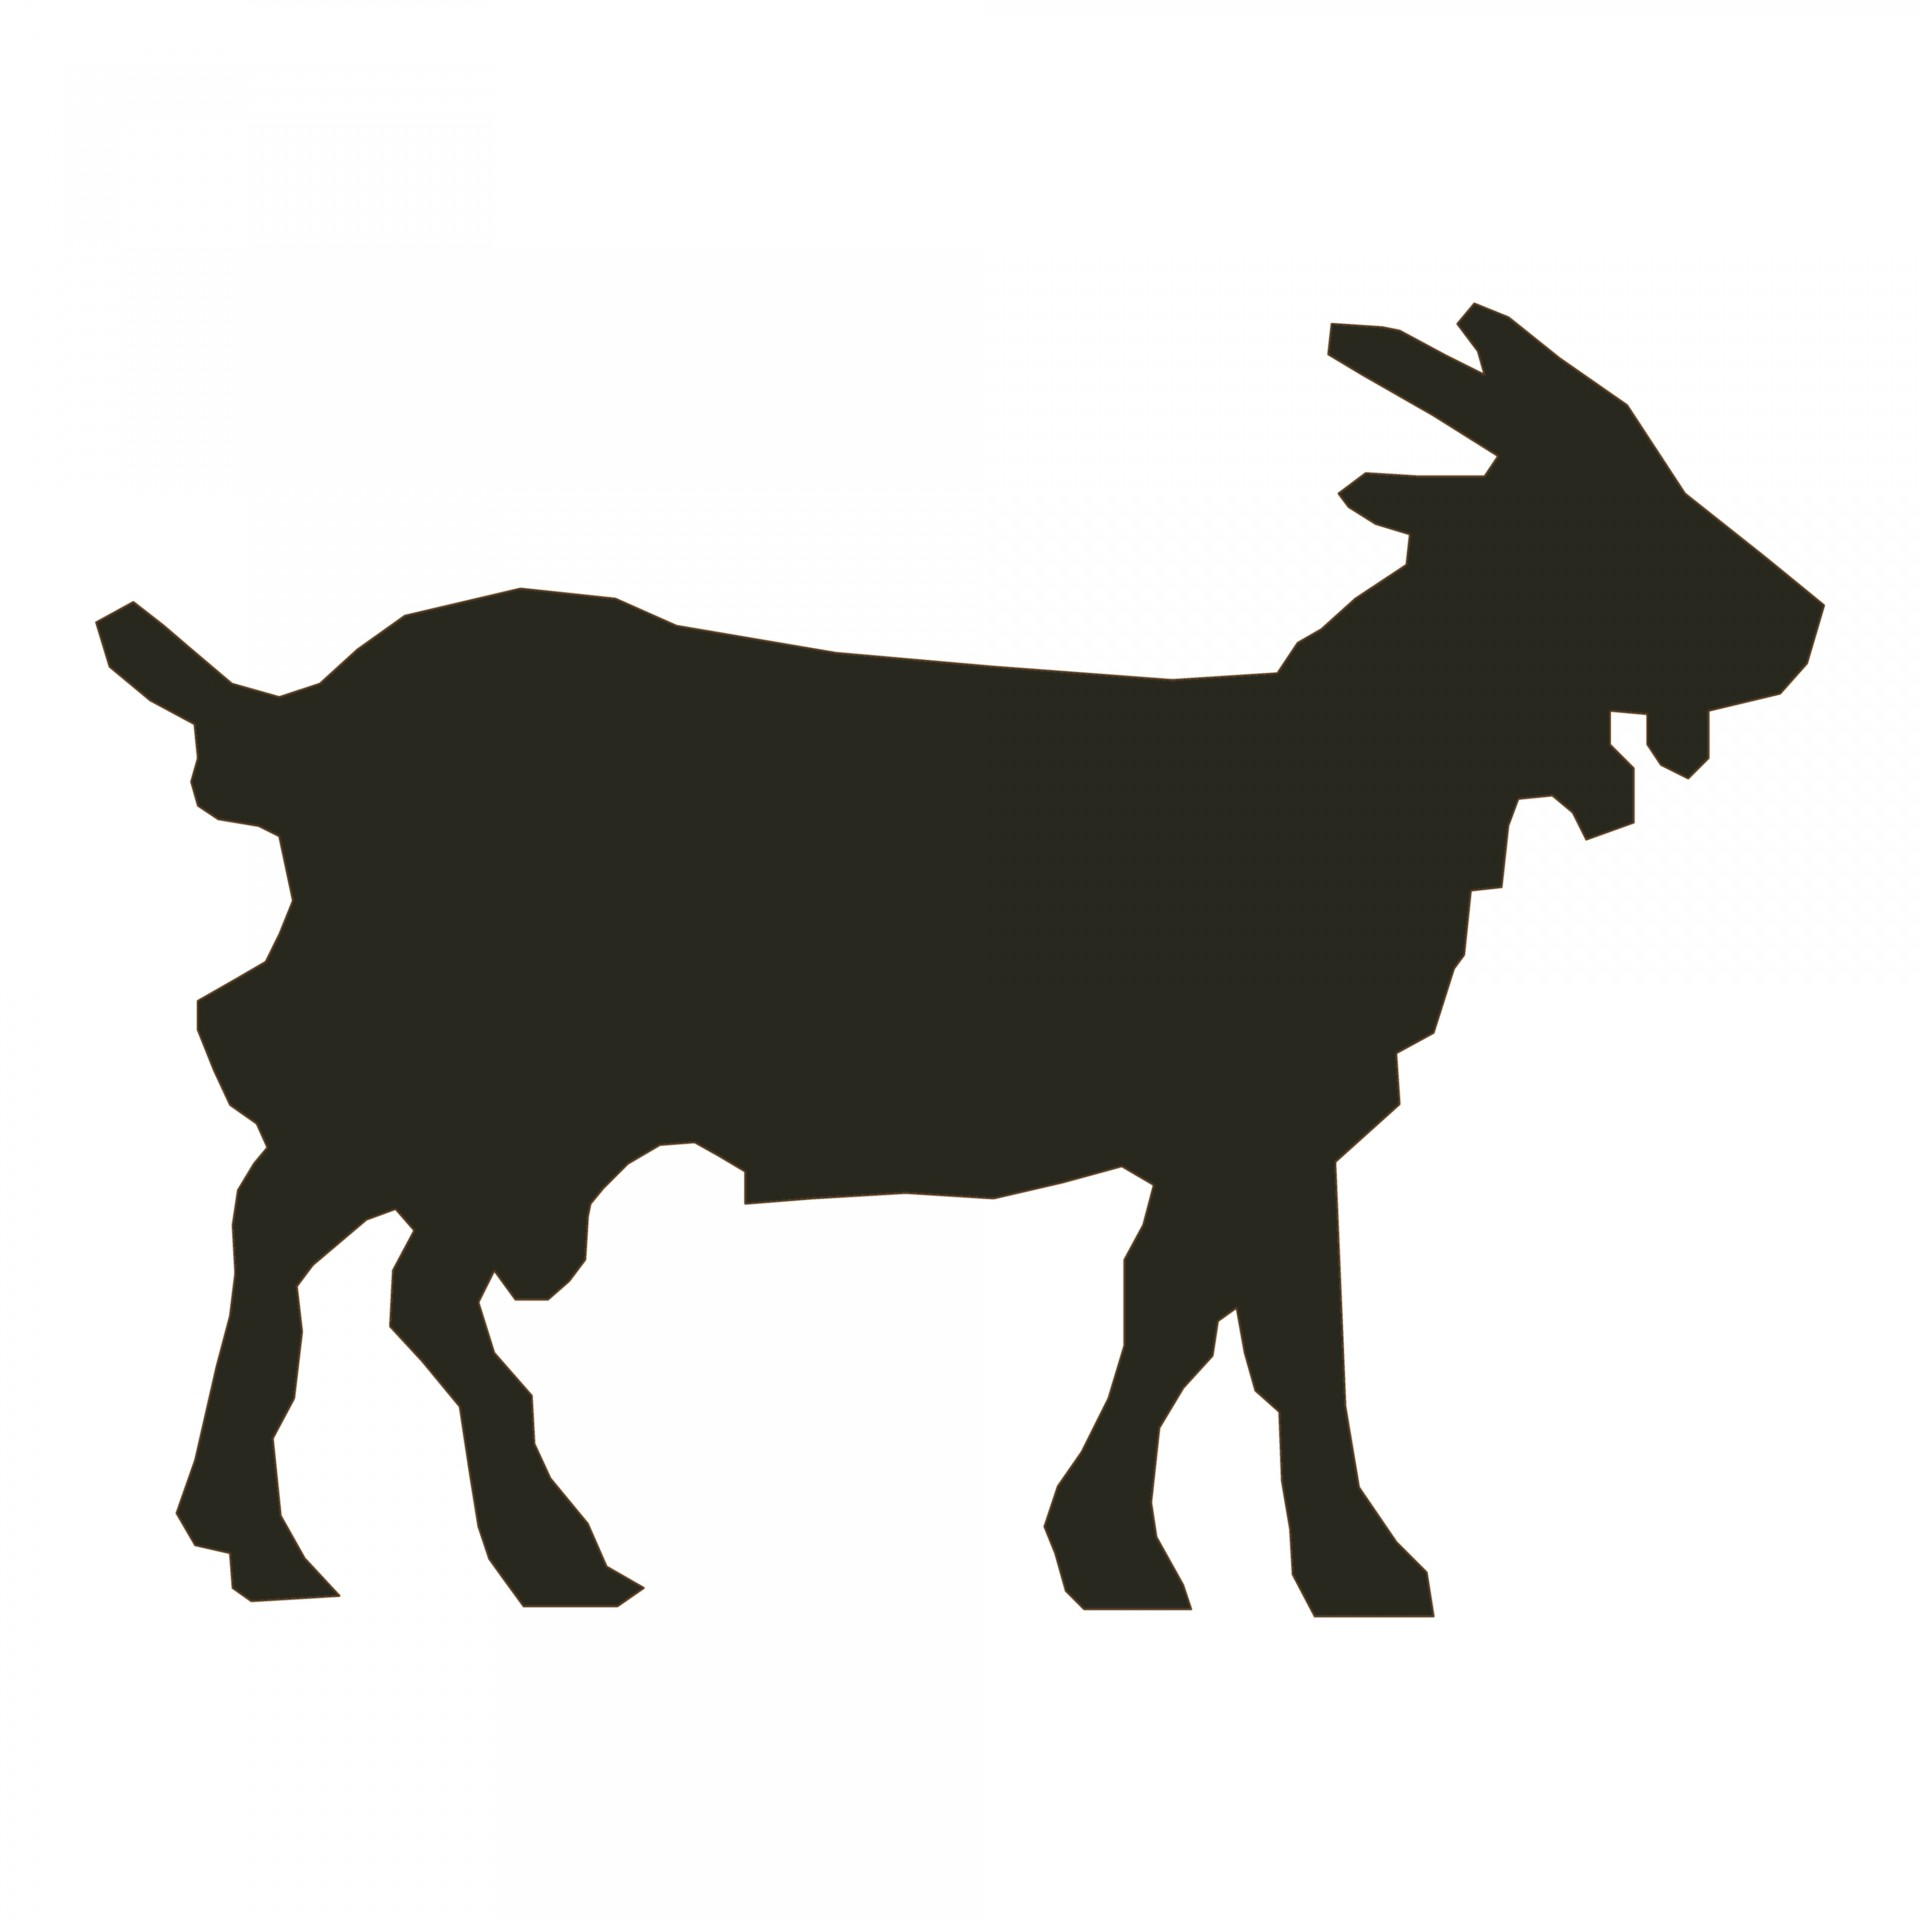 1920x1920 Goat Silhouette Free Stock Photo